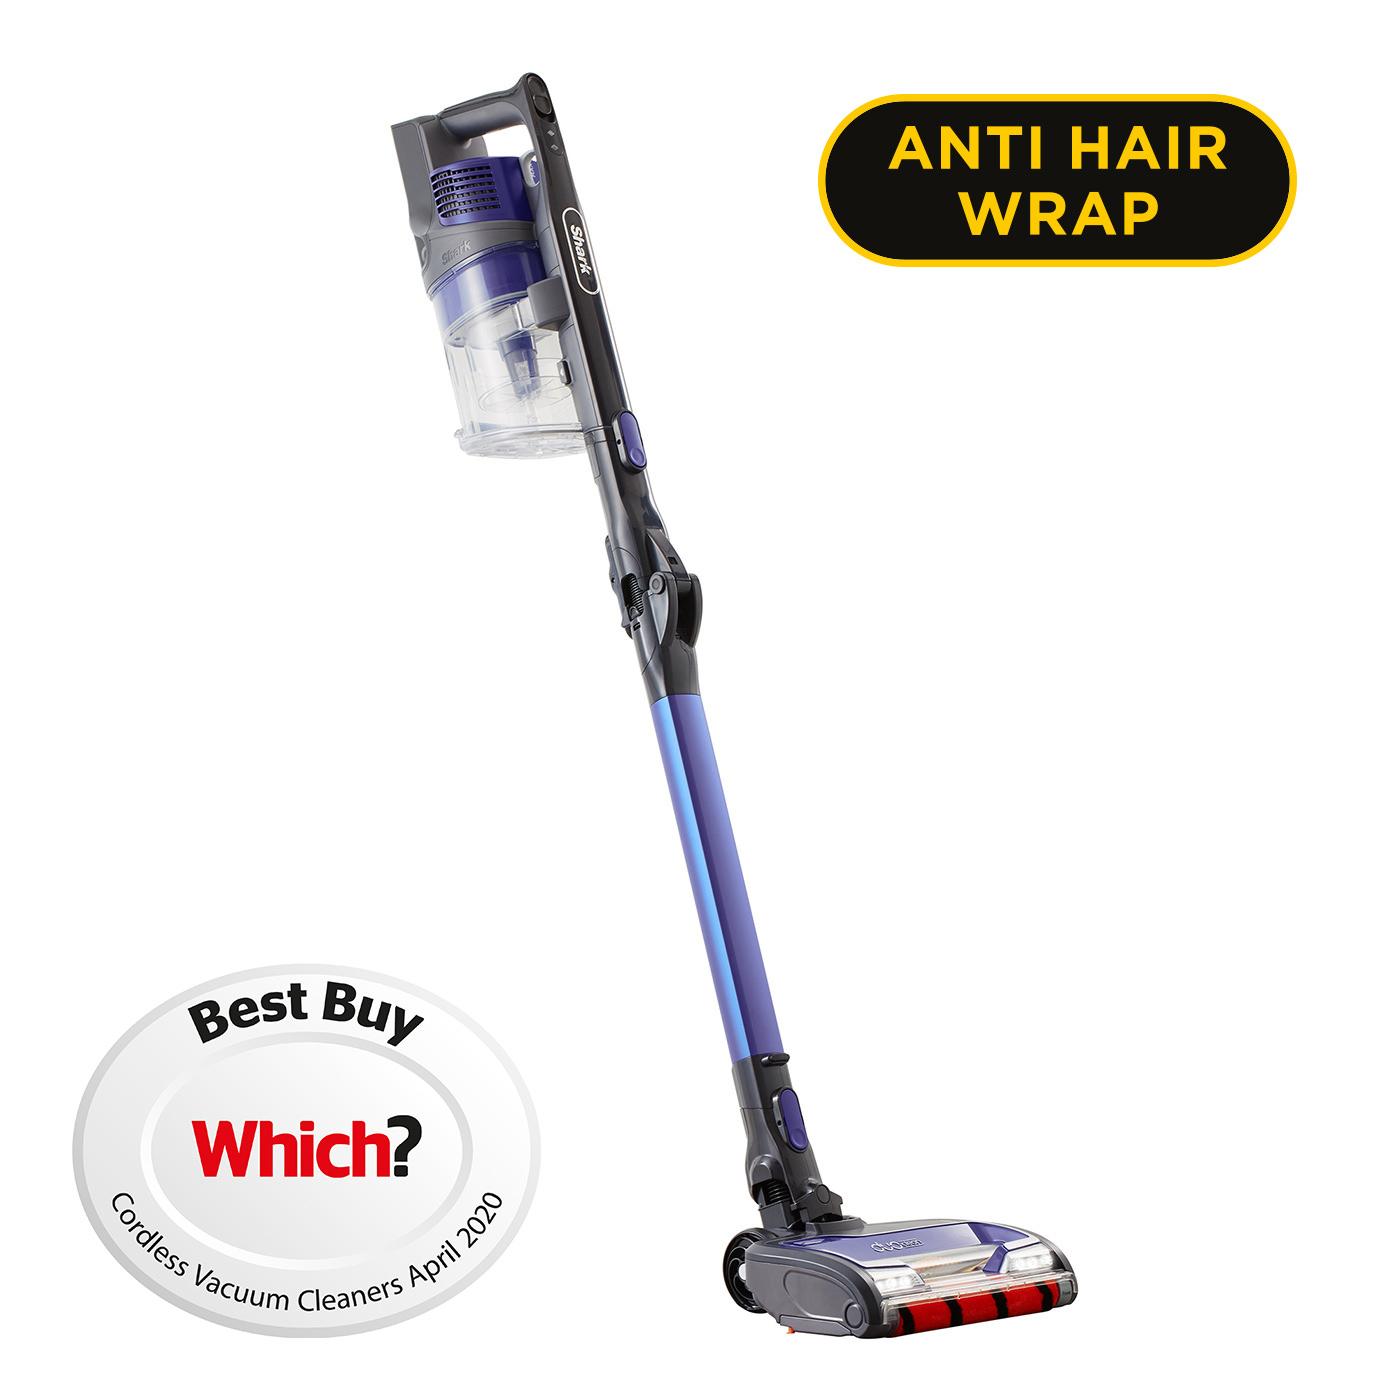 Shark Anti Hair Wrap Cordless Stick Vacuum Cleaner with Flexology [Twin Battery] IZ251UK - £314.99 @ Shark